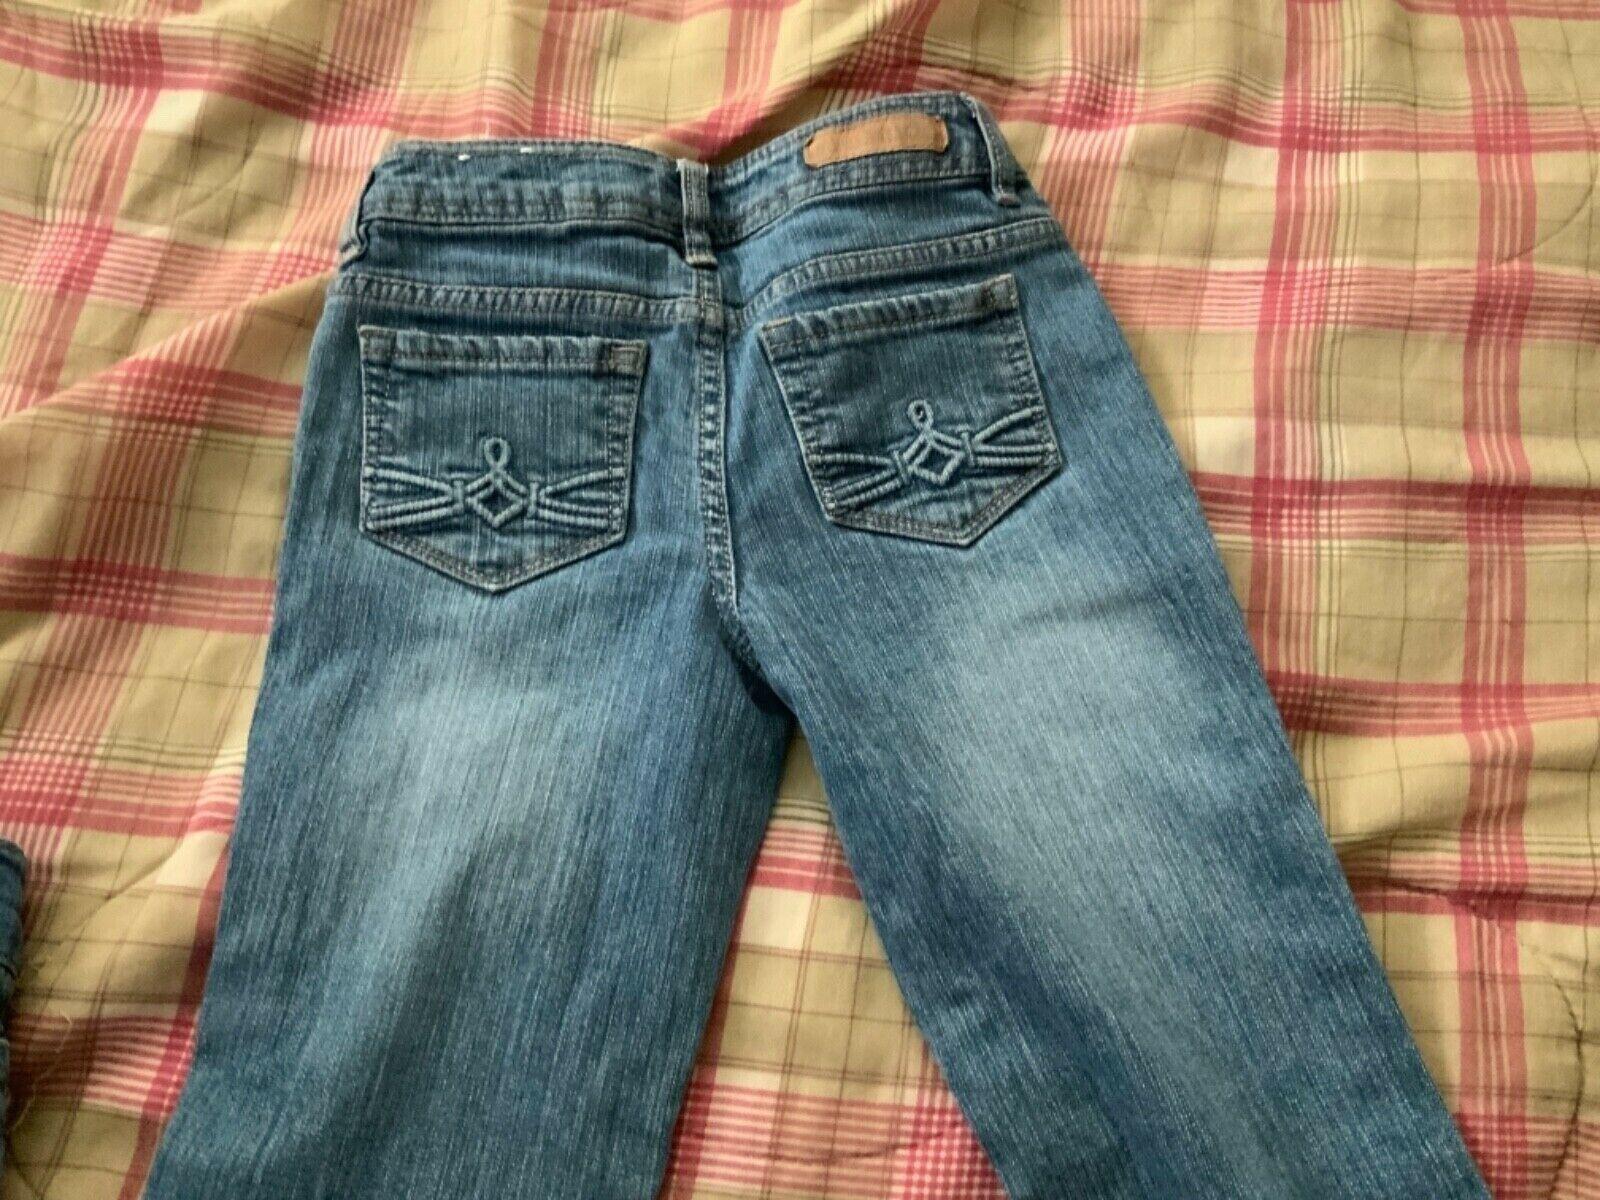 Mudd Girl Jeans Size 10 SLIM Pocket Detail Adjustable Waist Boot Cut Or Flare